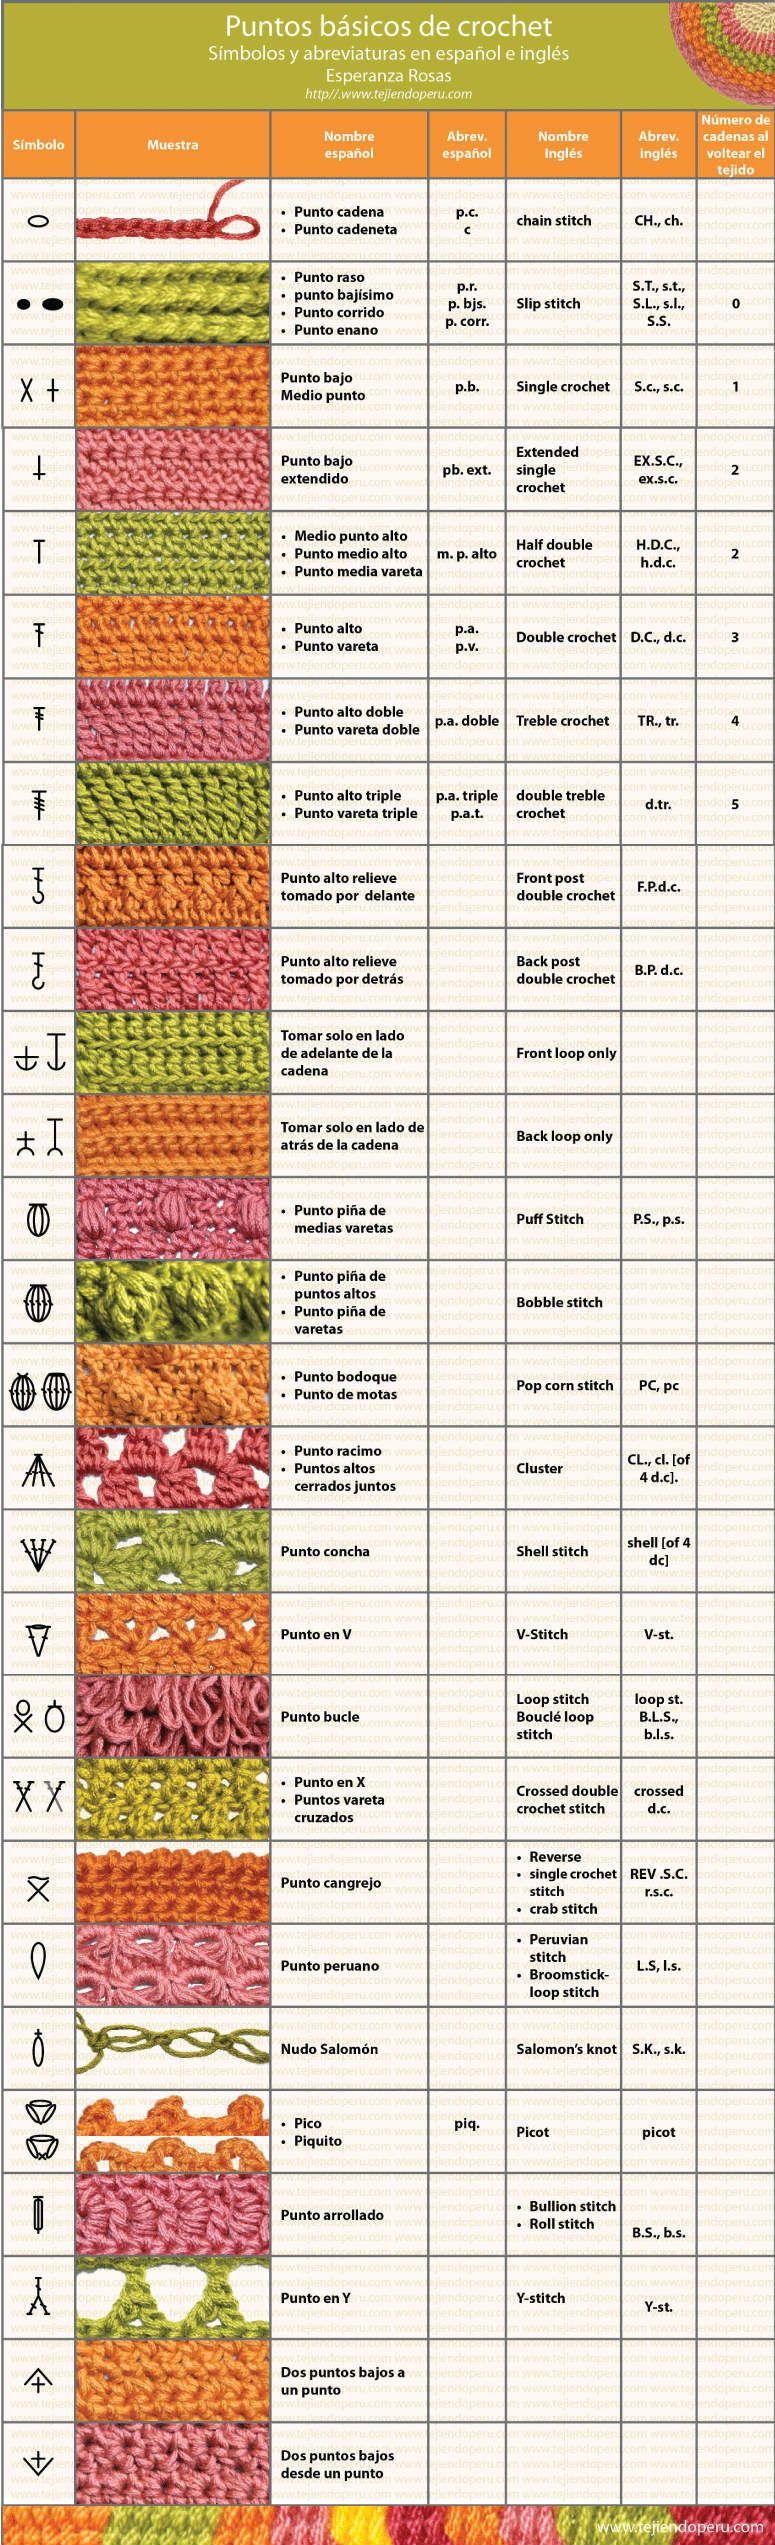 abreviaturas-puntos-crochet.jpg 775×2.545 piksel